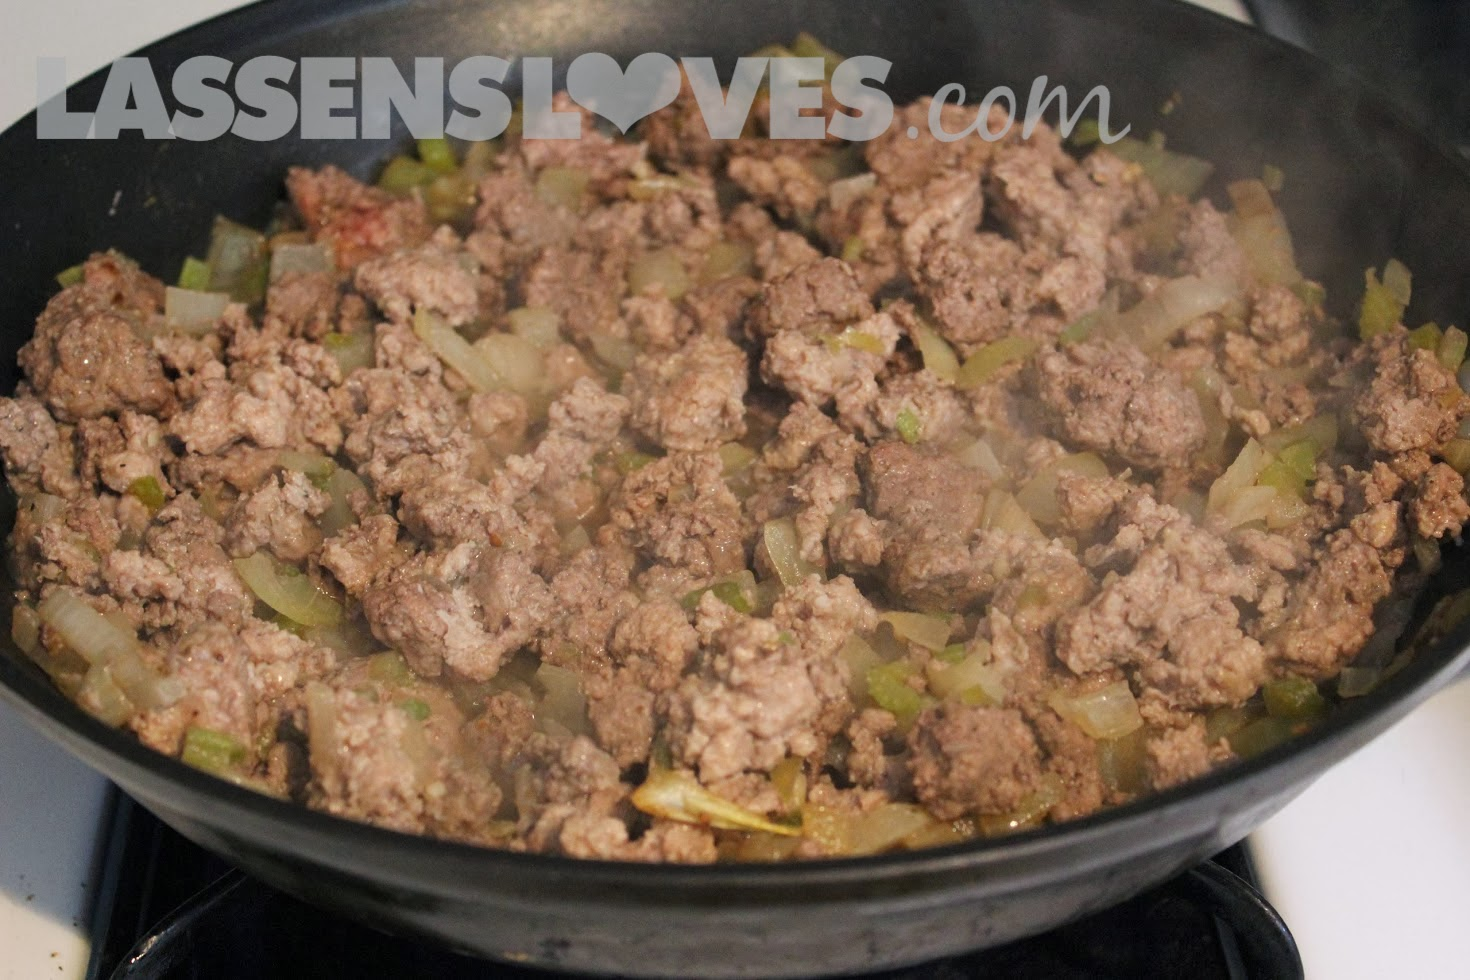 Ukrainian+Cabbage+Rolls, Cabbage+Rolls